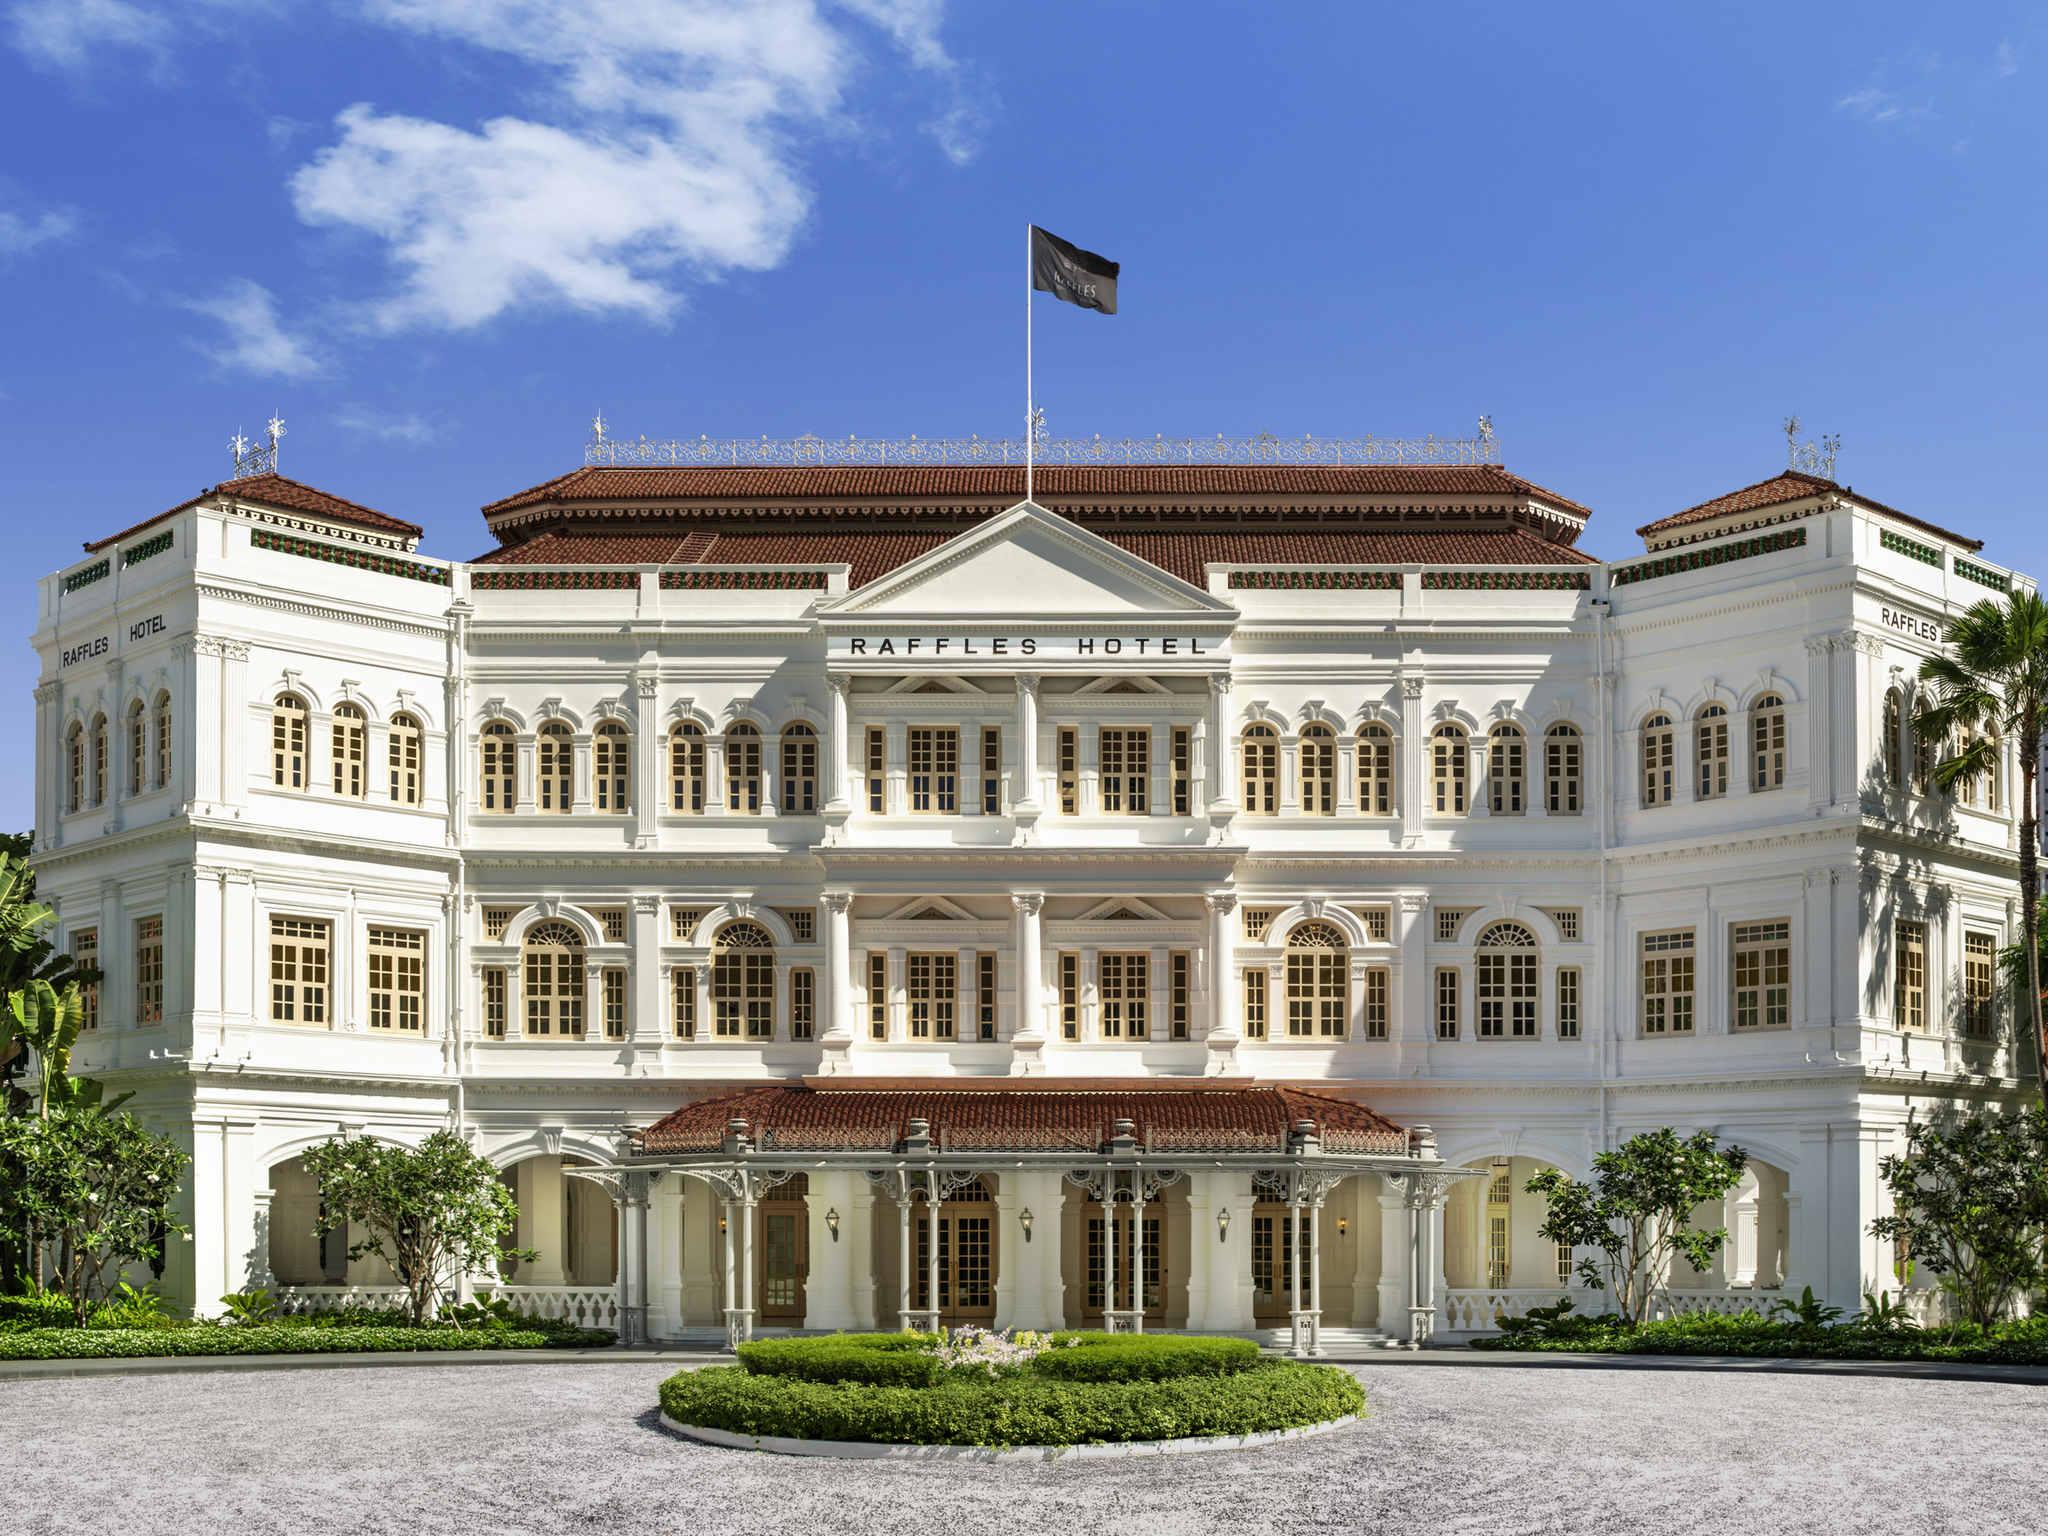 Hotel - Raffles Singapore - Neueröffnung im 1. Quartal 2019